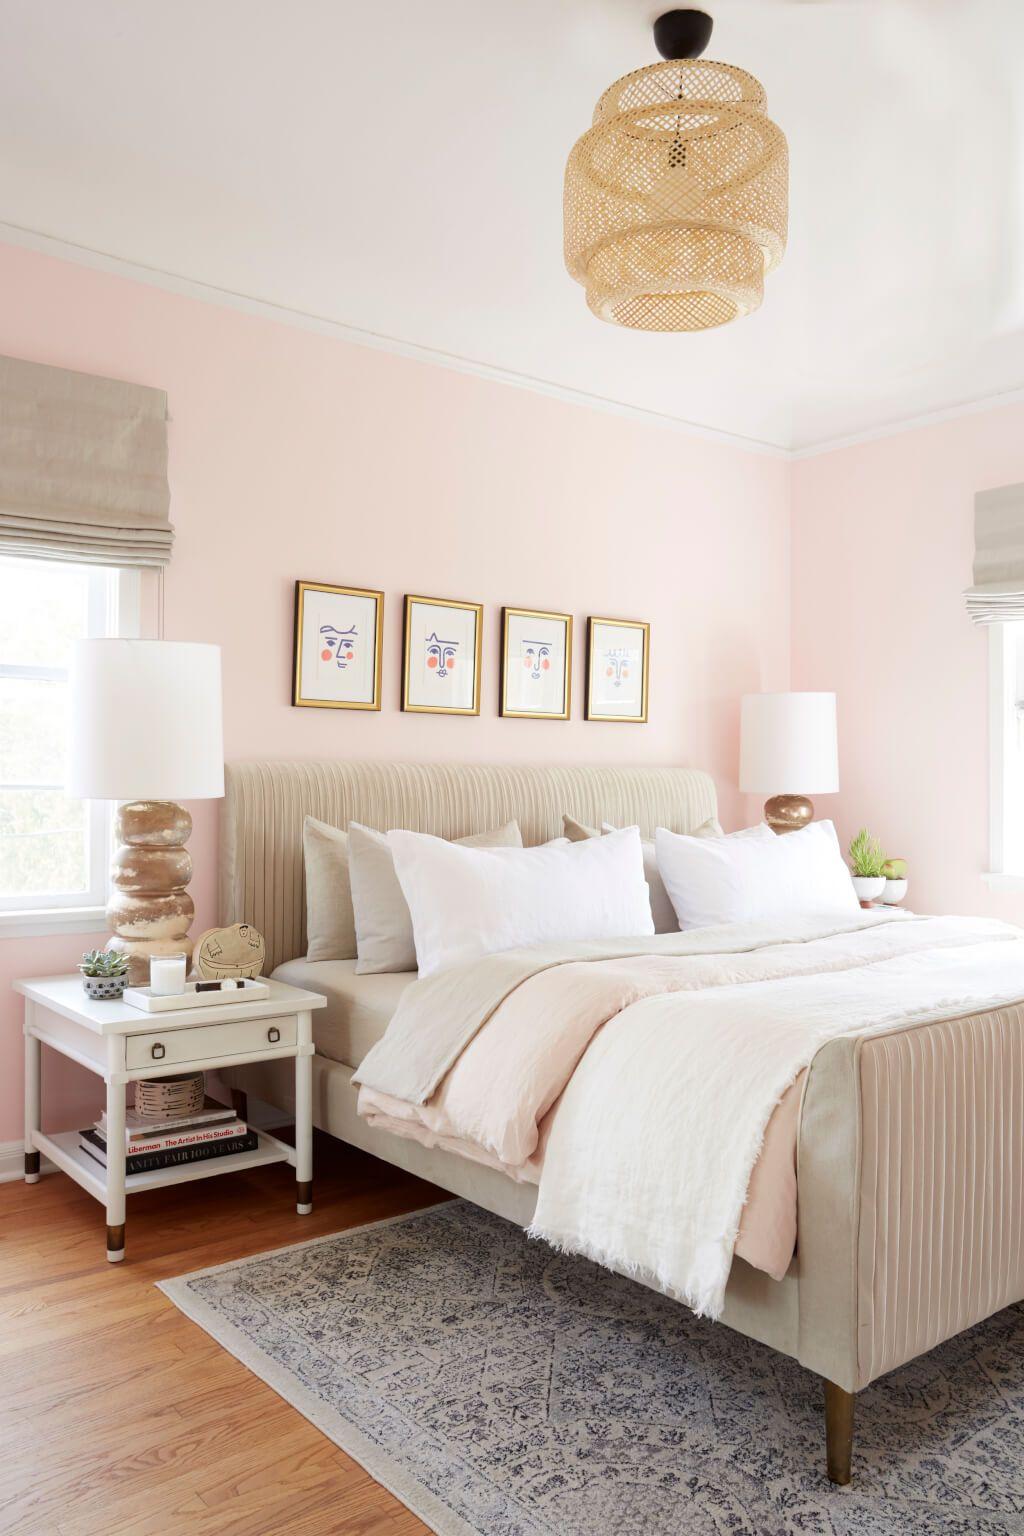 Orlando S Master Bedroom Reveal Emily Henderson Pink Bedroom Design Woman Bedroom Bedroom Interior Newest pastel pink bedroom